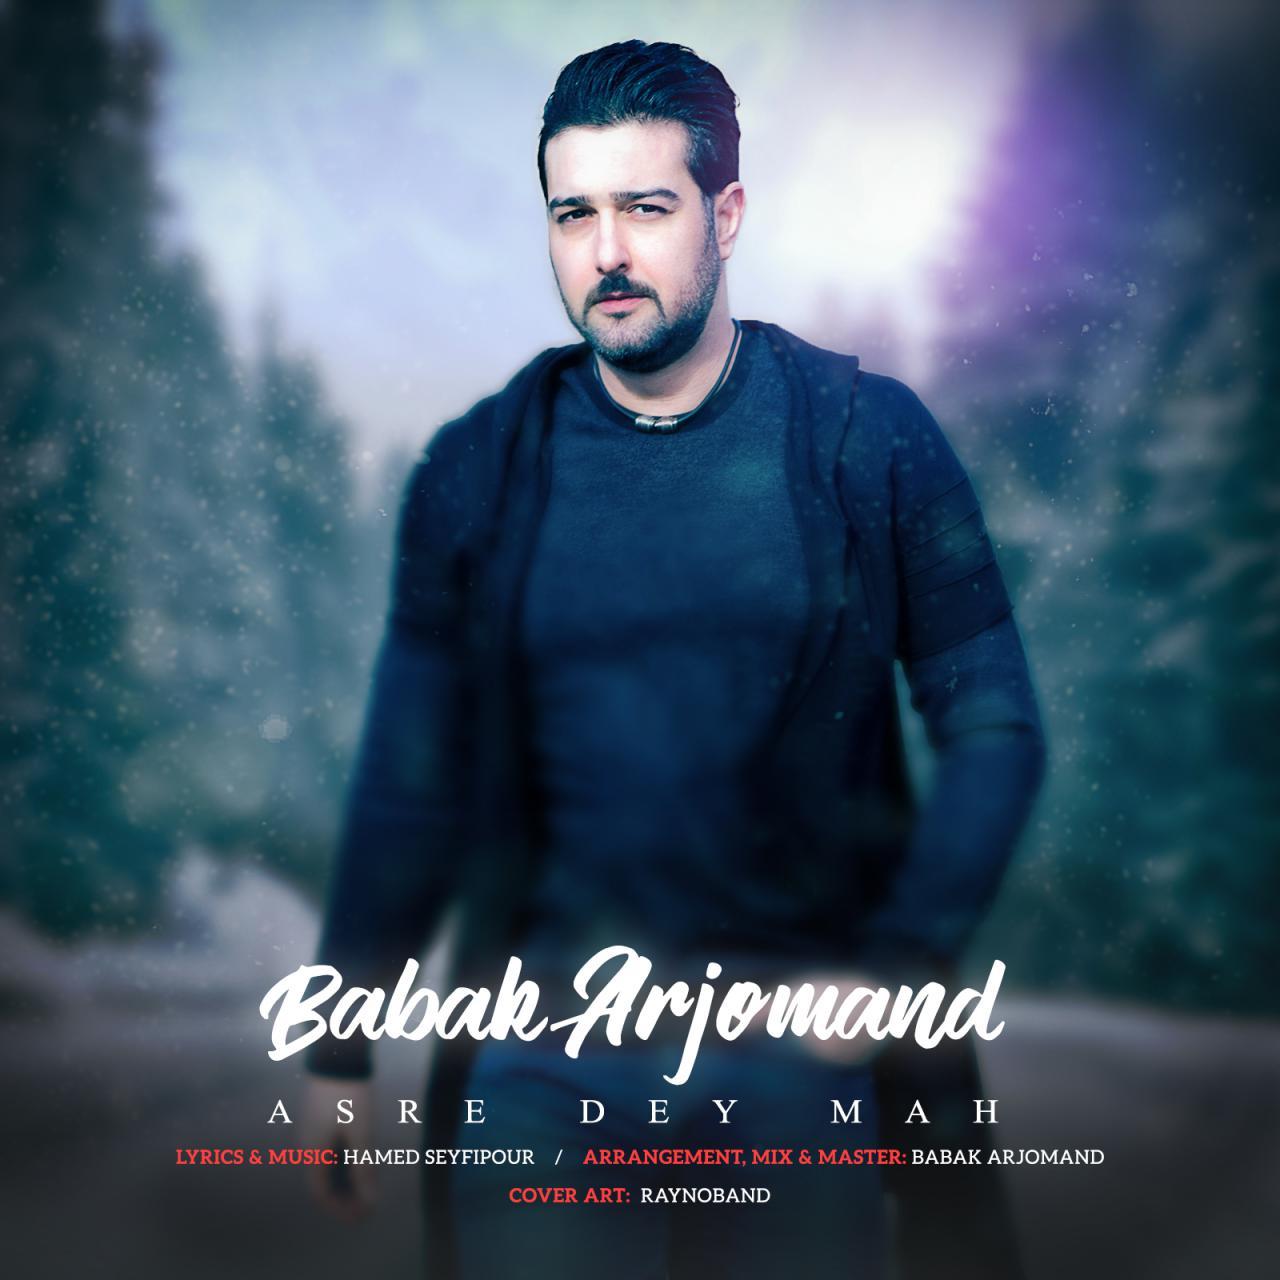 Babak Arjomand – Asre Dey Mah